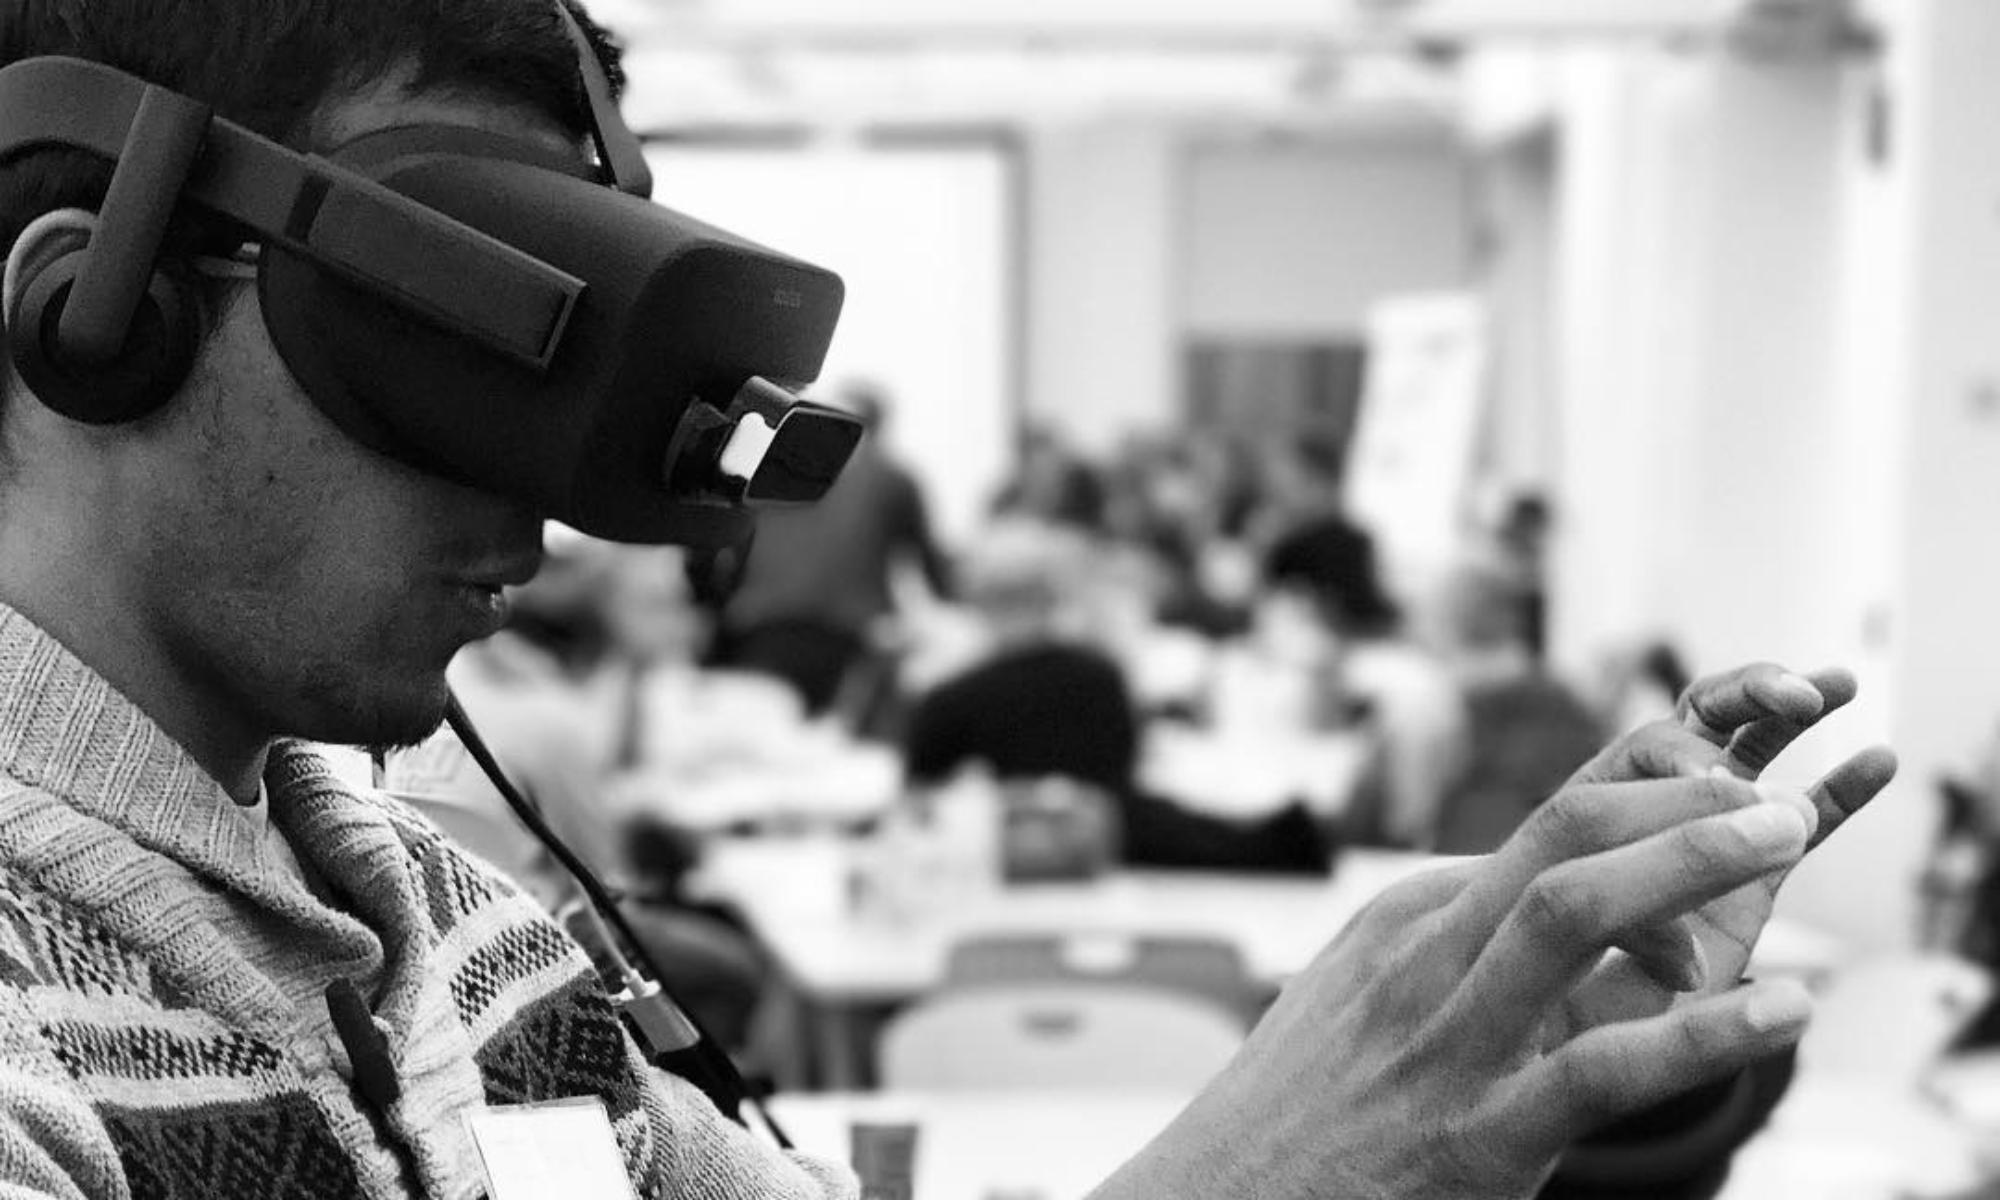 VR, AR, SR, MR, HR, all the Realities